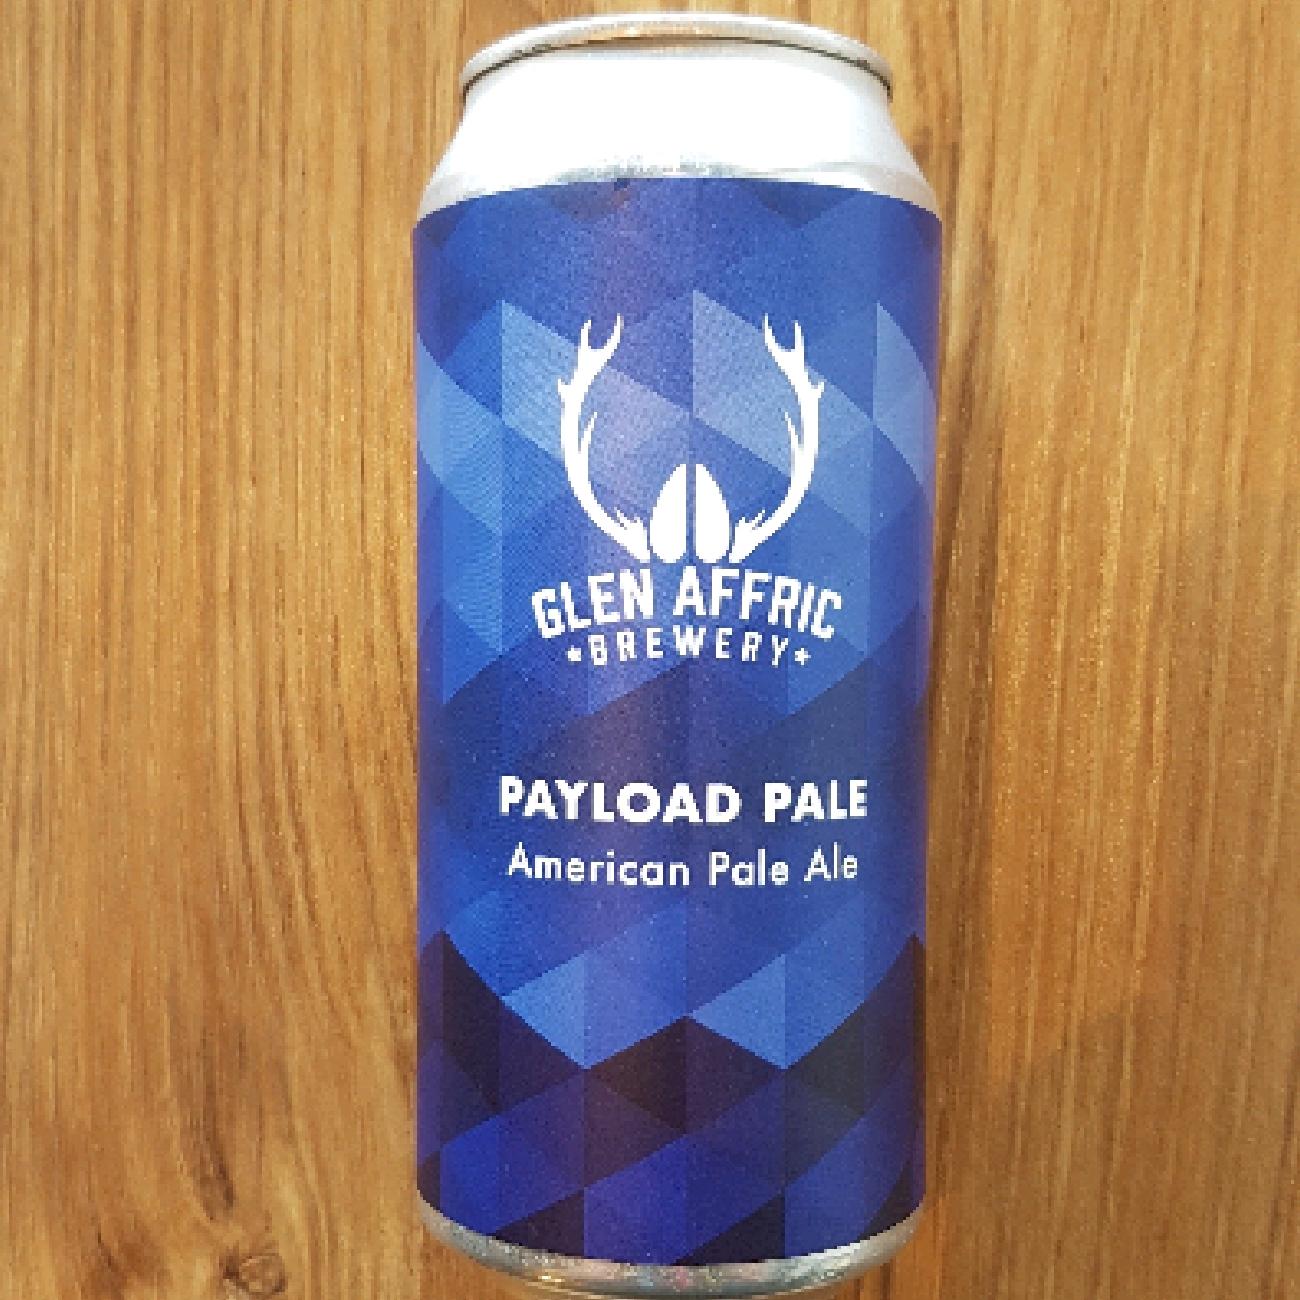 Glen Affric Payload Pale